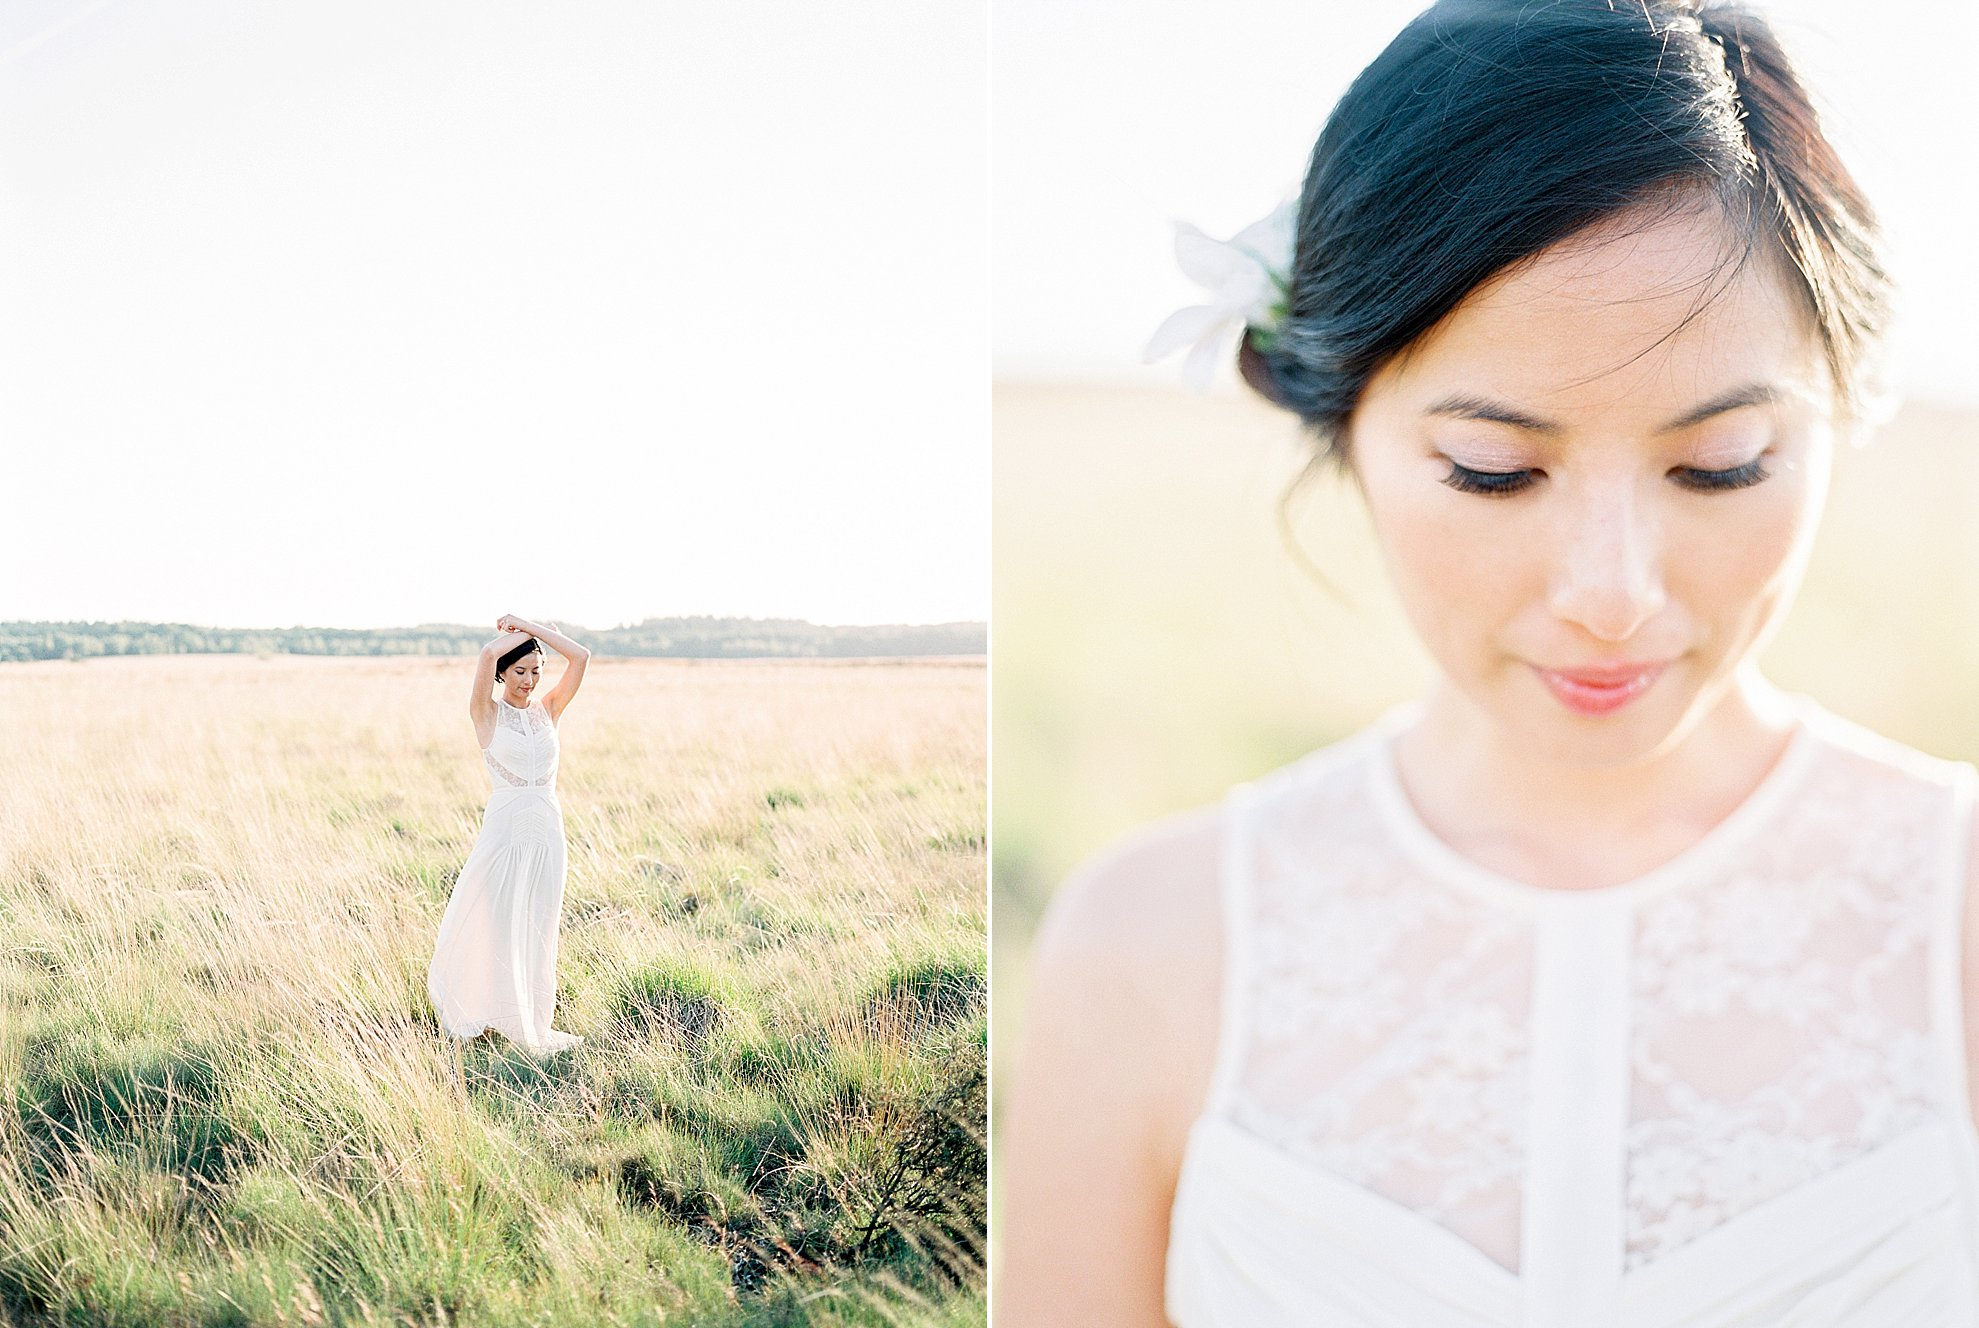 Amanda-Drost-Fine-art-photography-film-fotografie-analoog_0308.jpg